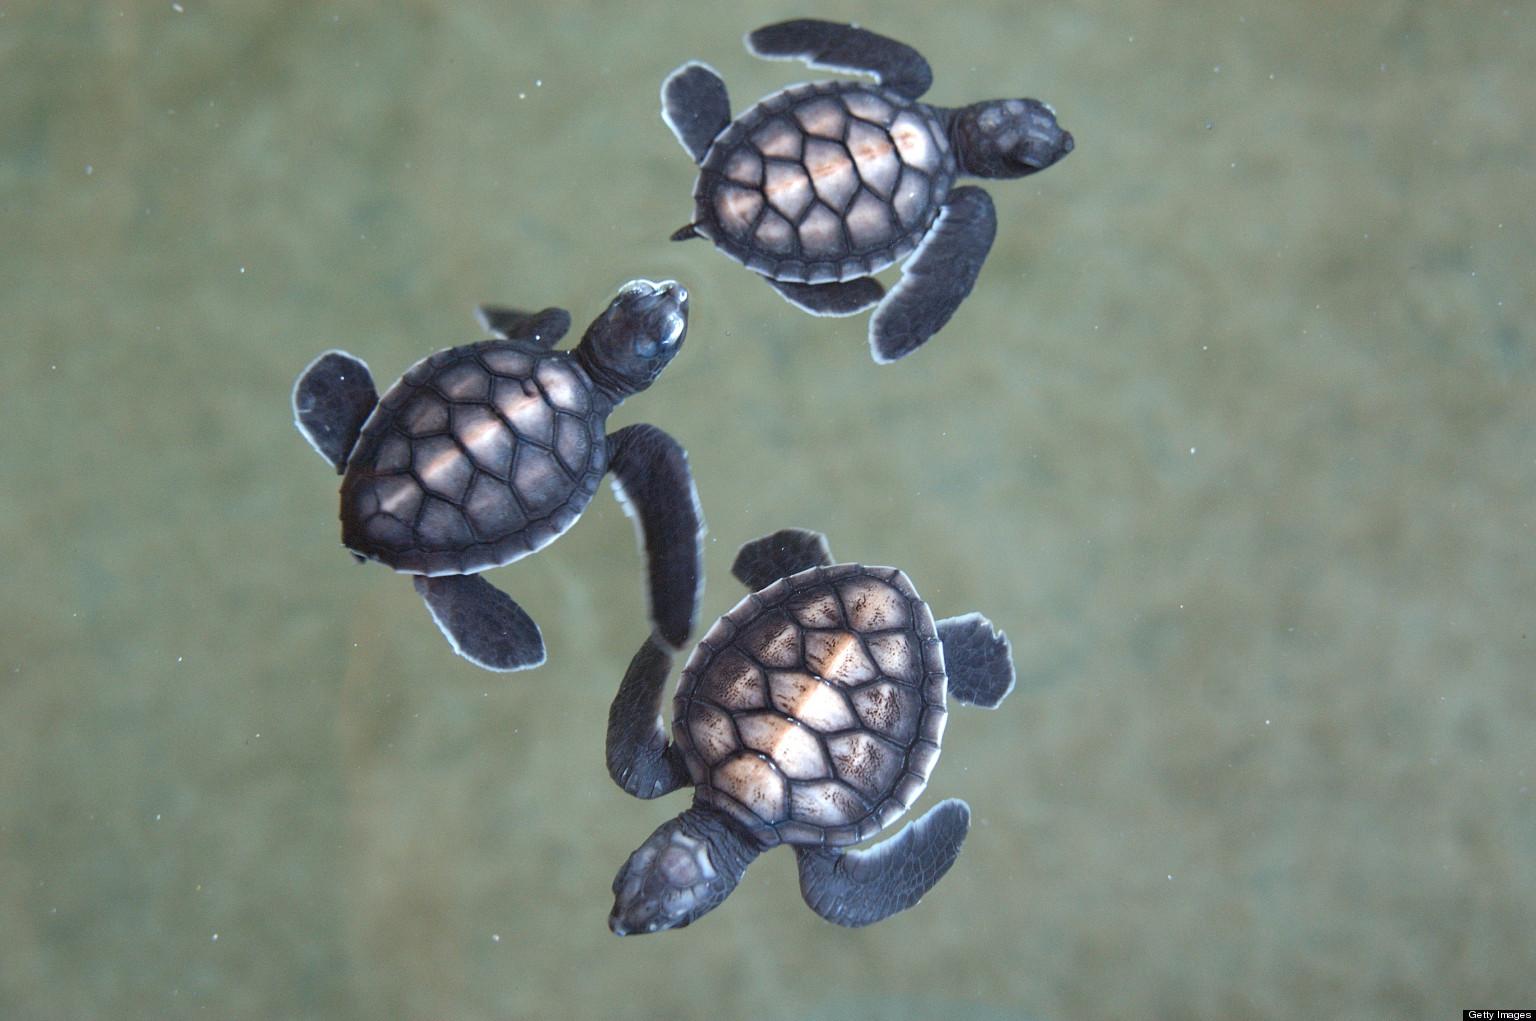 Baby Green Sea Turtles - photo#46